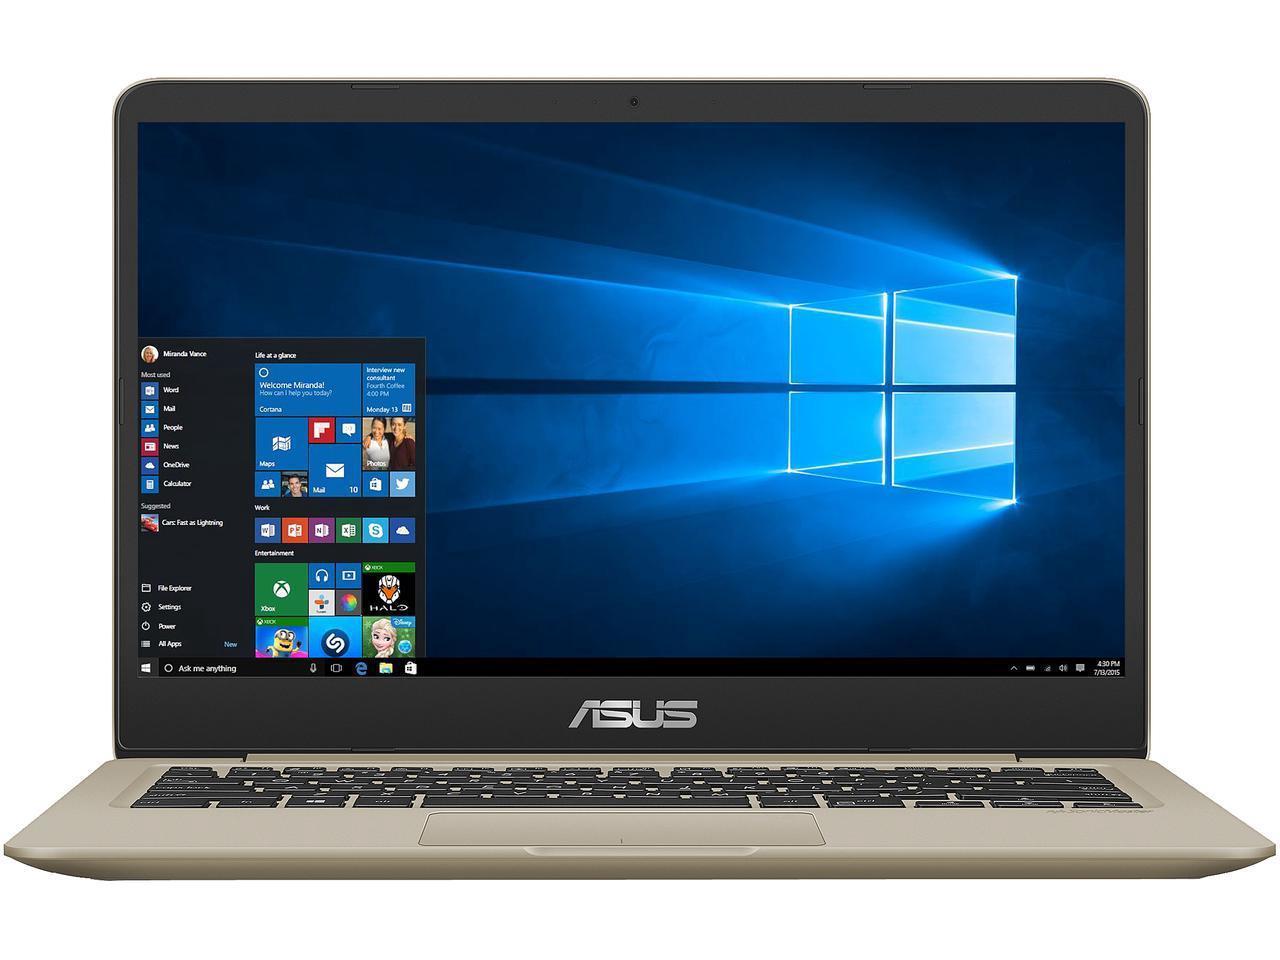 Asus VivoBook S S410UQ-NH74 Laptop: 14'' FHD IPS, i7-8550U, 8GB DDR4, 256GB SSD, GT 940MX 2GB @ $703 + F/S via Newegg Mobile App